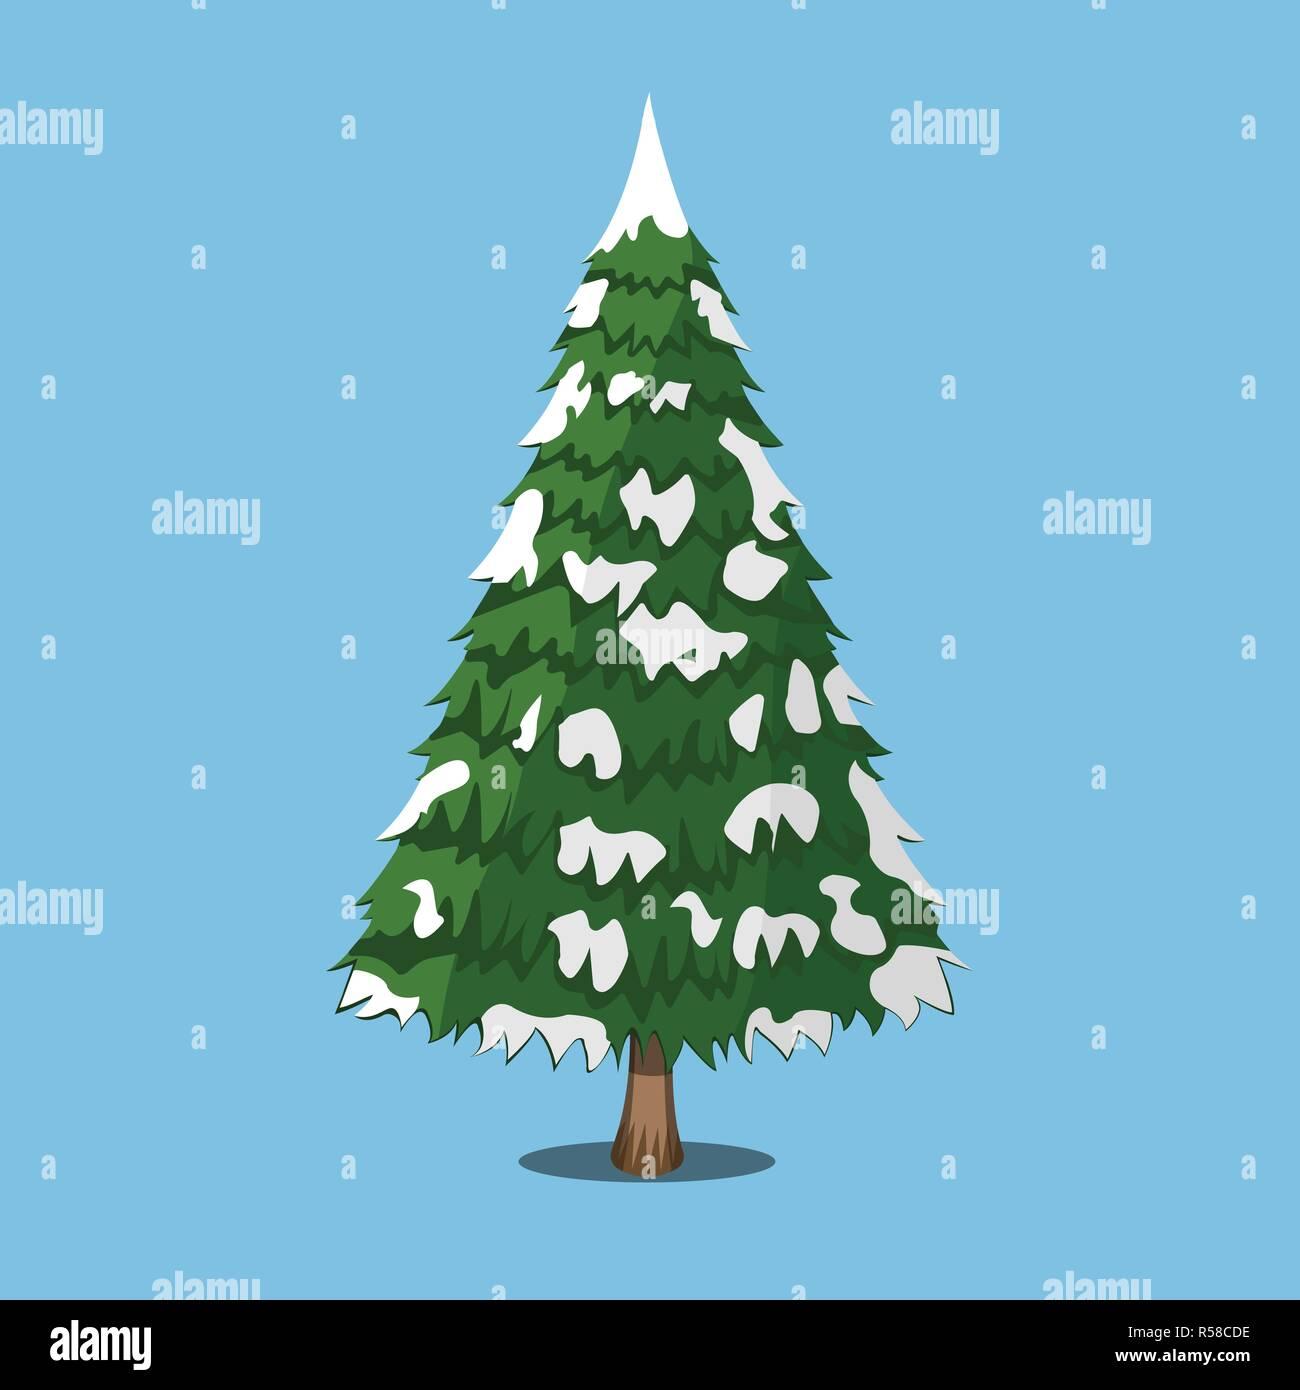 Christmas Tree Xmas Icon Cartoon Style Vector Illustration For Christmas Day Stock Vector Image Art Alamy Plant tree, bush and green tree, forest tree illustration. alamy